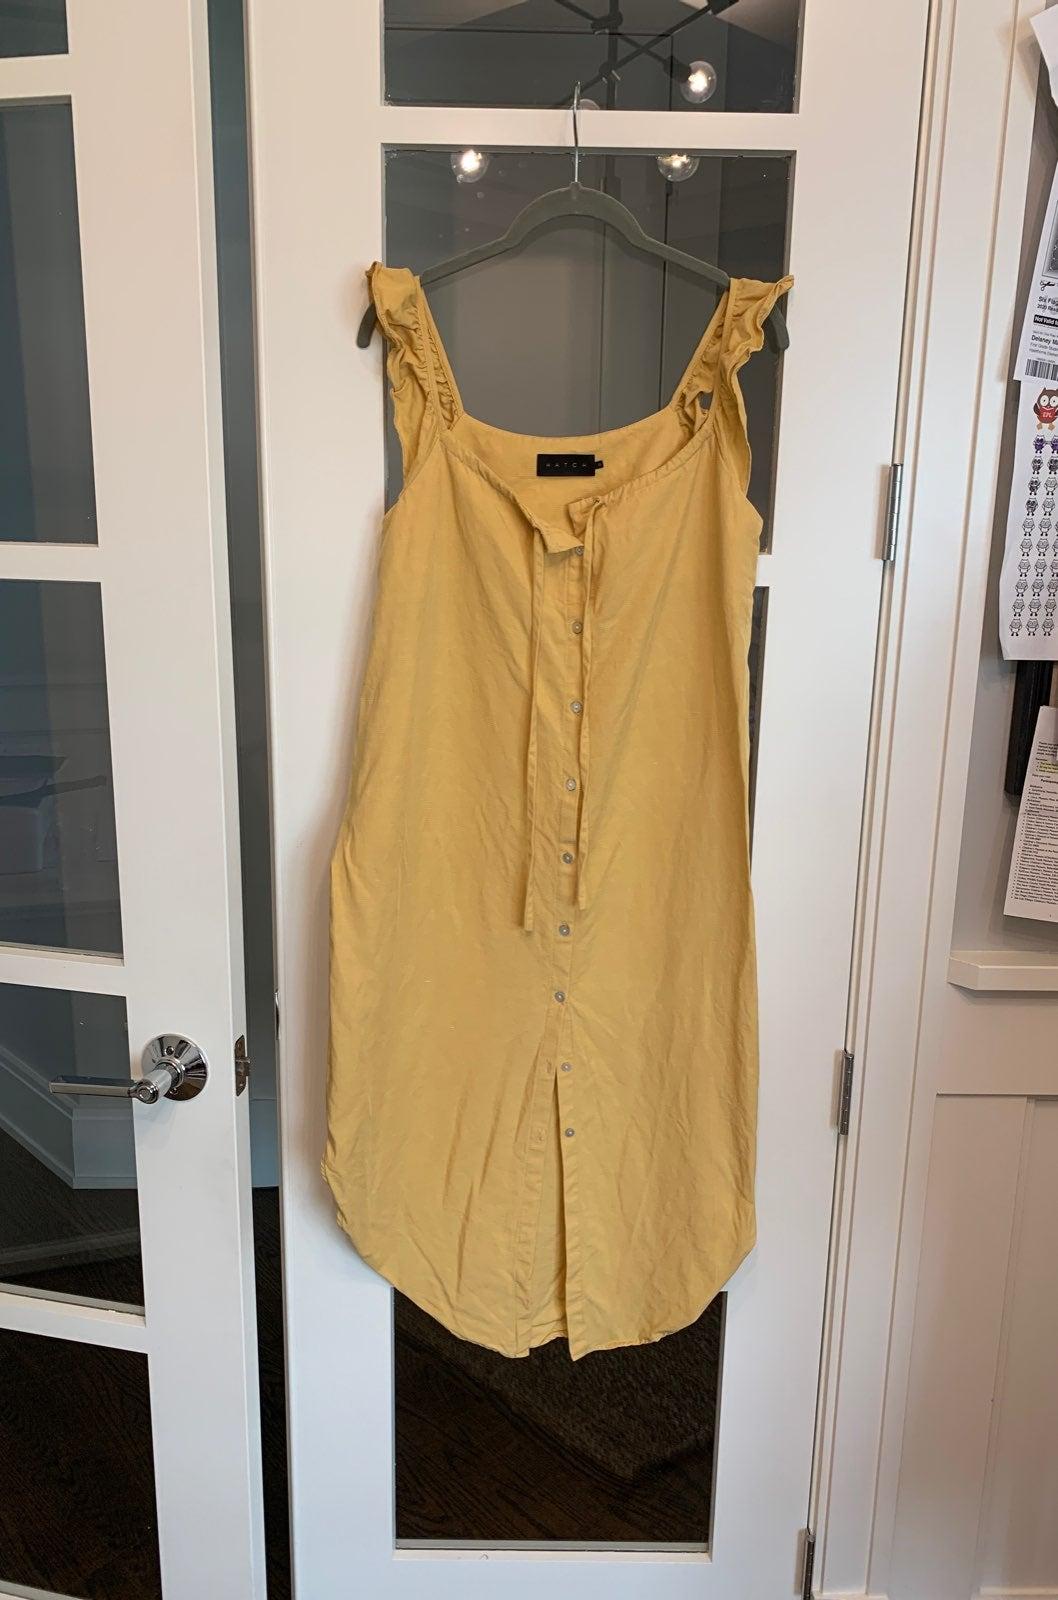 Hatch Yellow Dress, Size 0